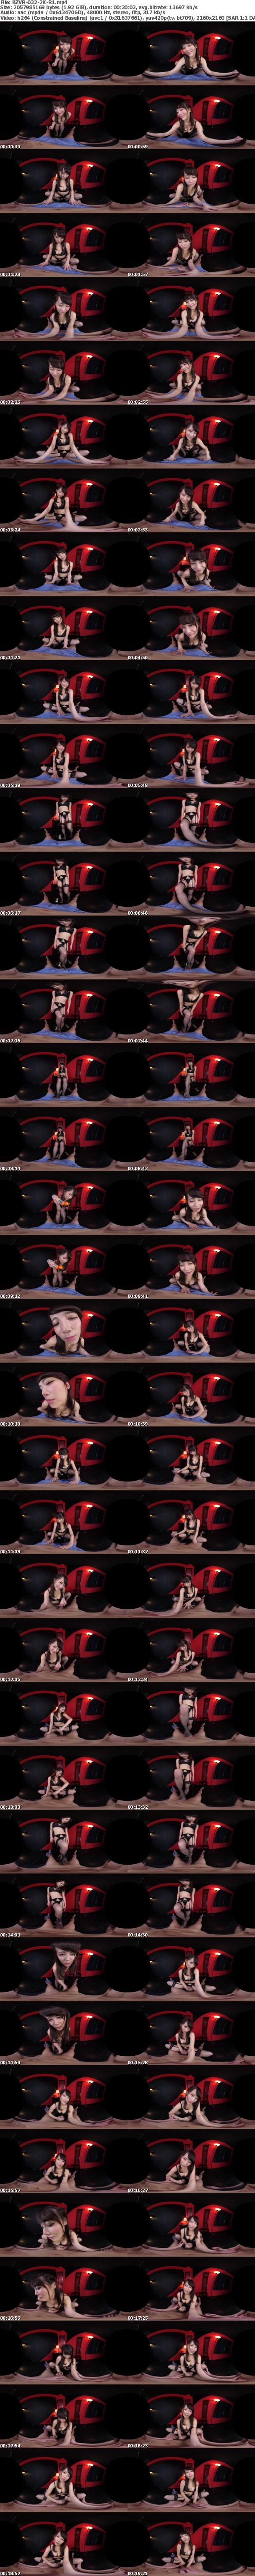 VR/3D BZVR-032 【匠】超高級M性感!!淫語と焦らしのテクニックと騎乗位セックス!! 倉多まお